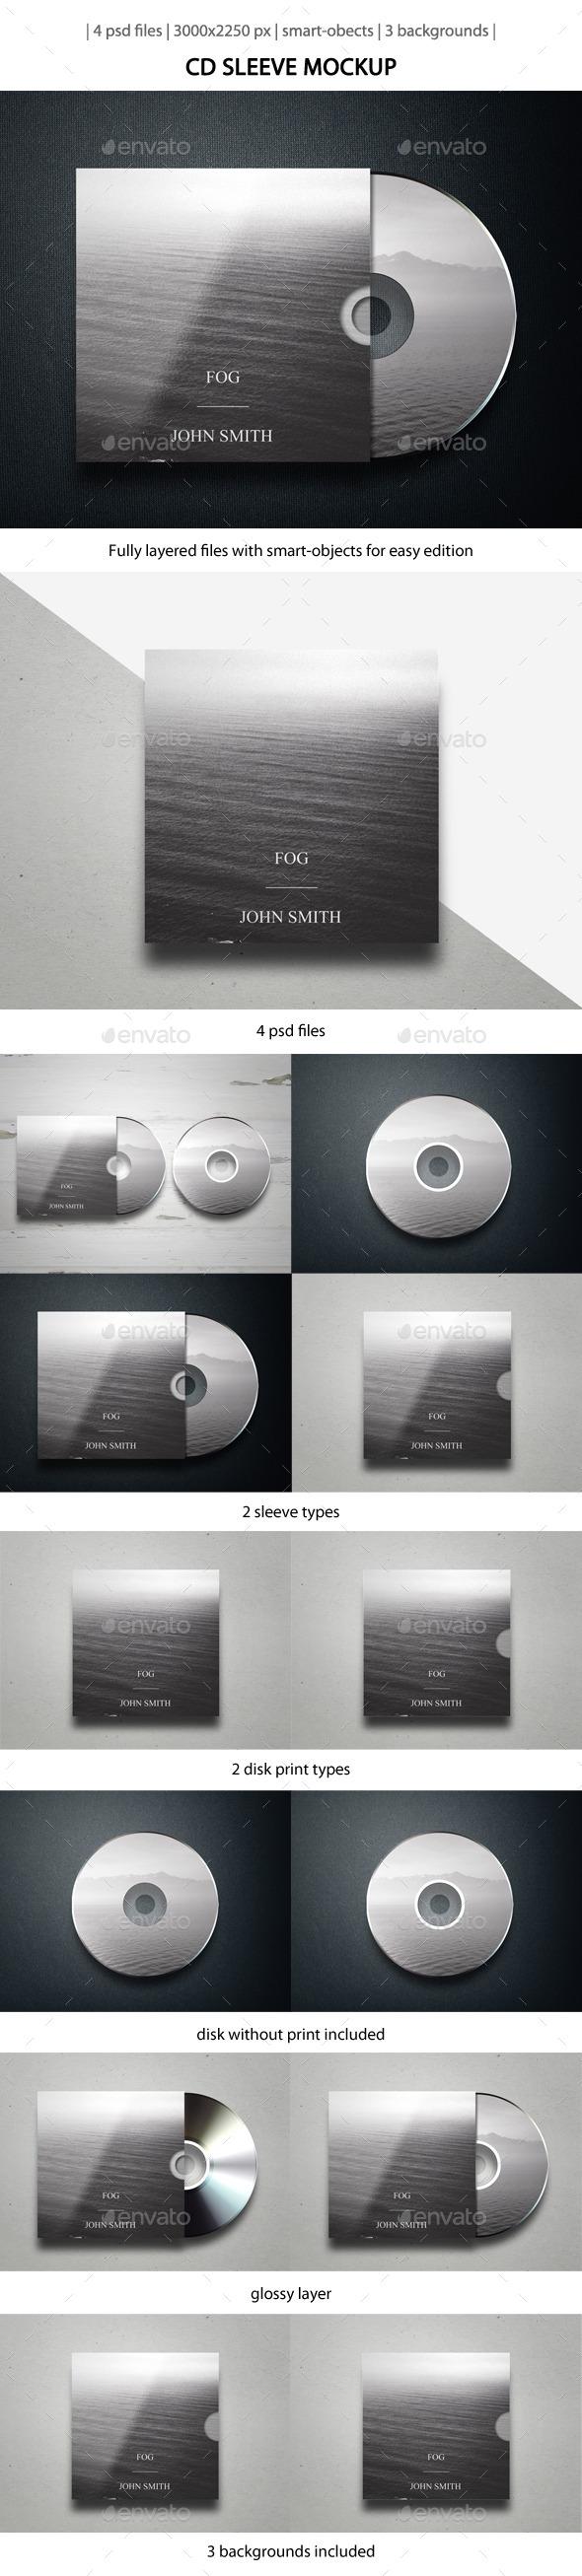 CD Sleeve Mockup - Miscellaneous Print